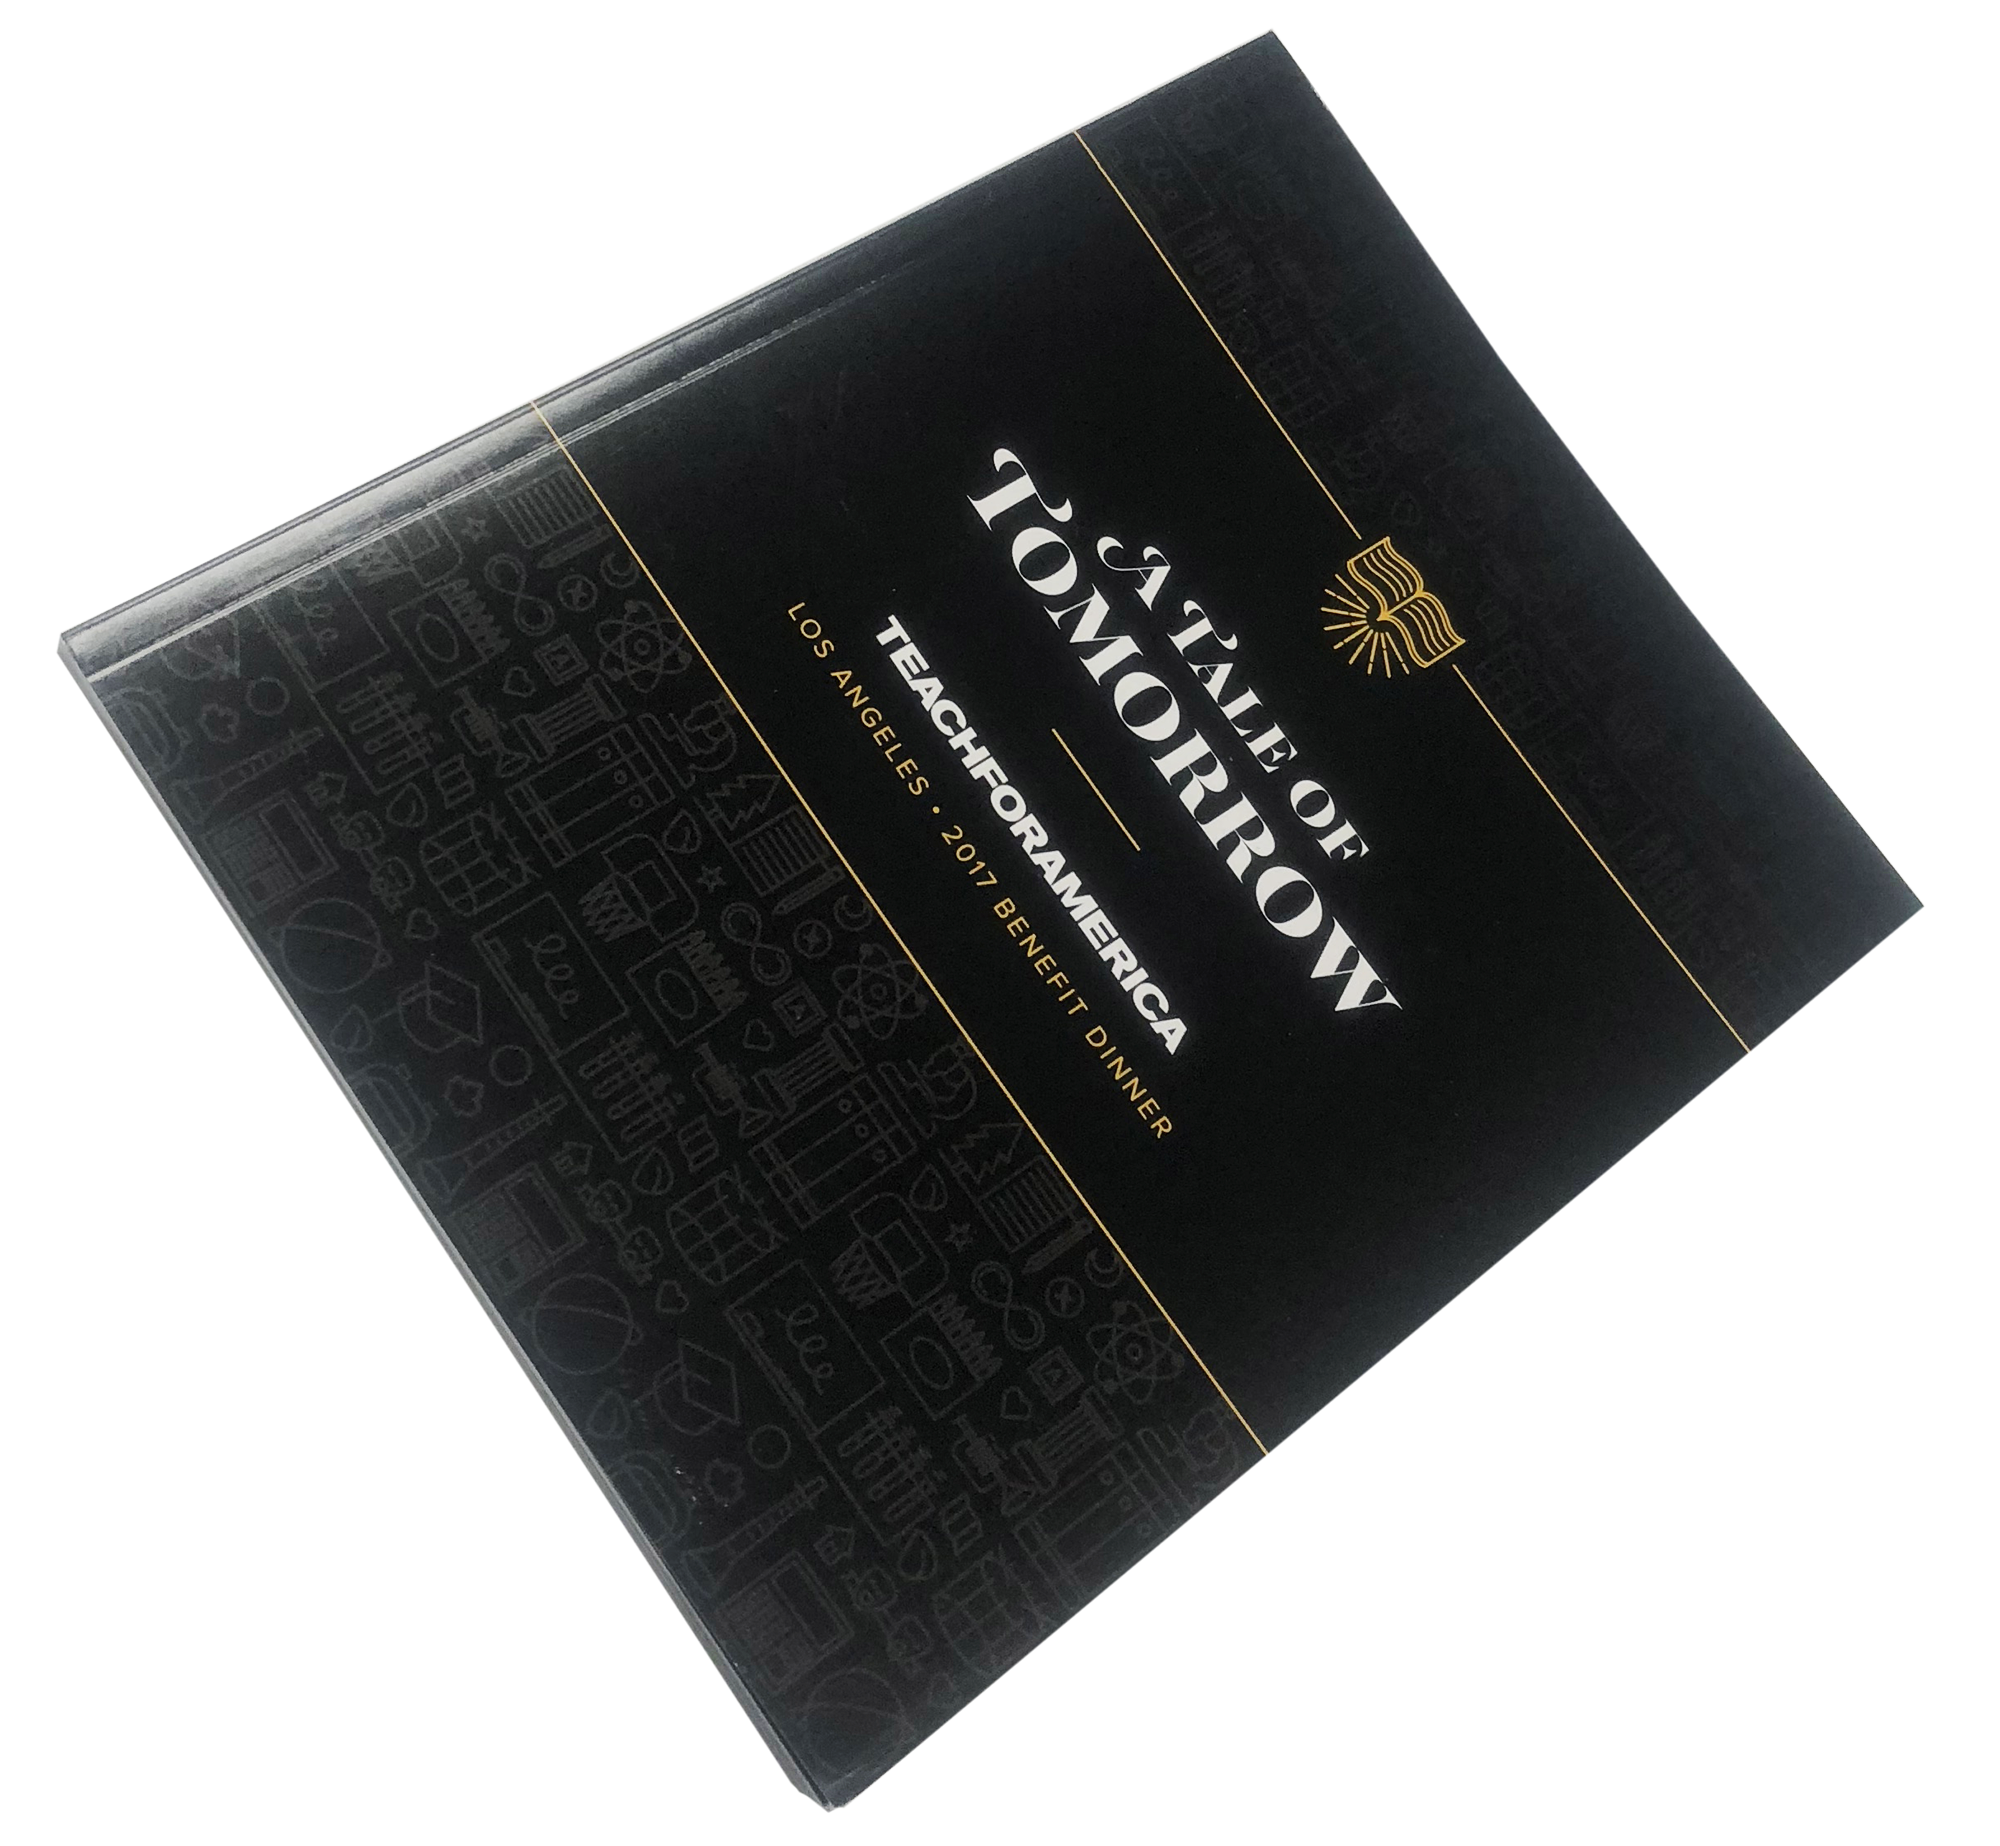 Catalog, Program Print Sample, Perfect Bound, 4 Color